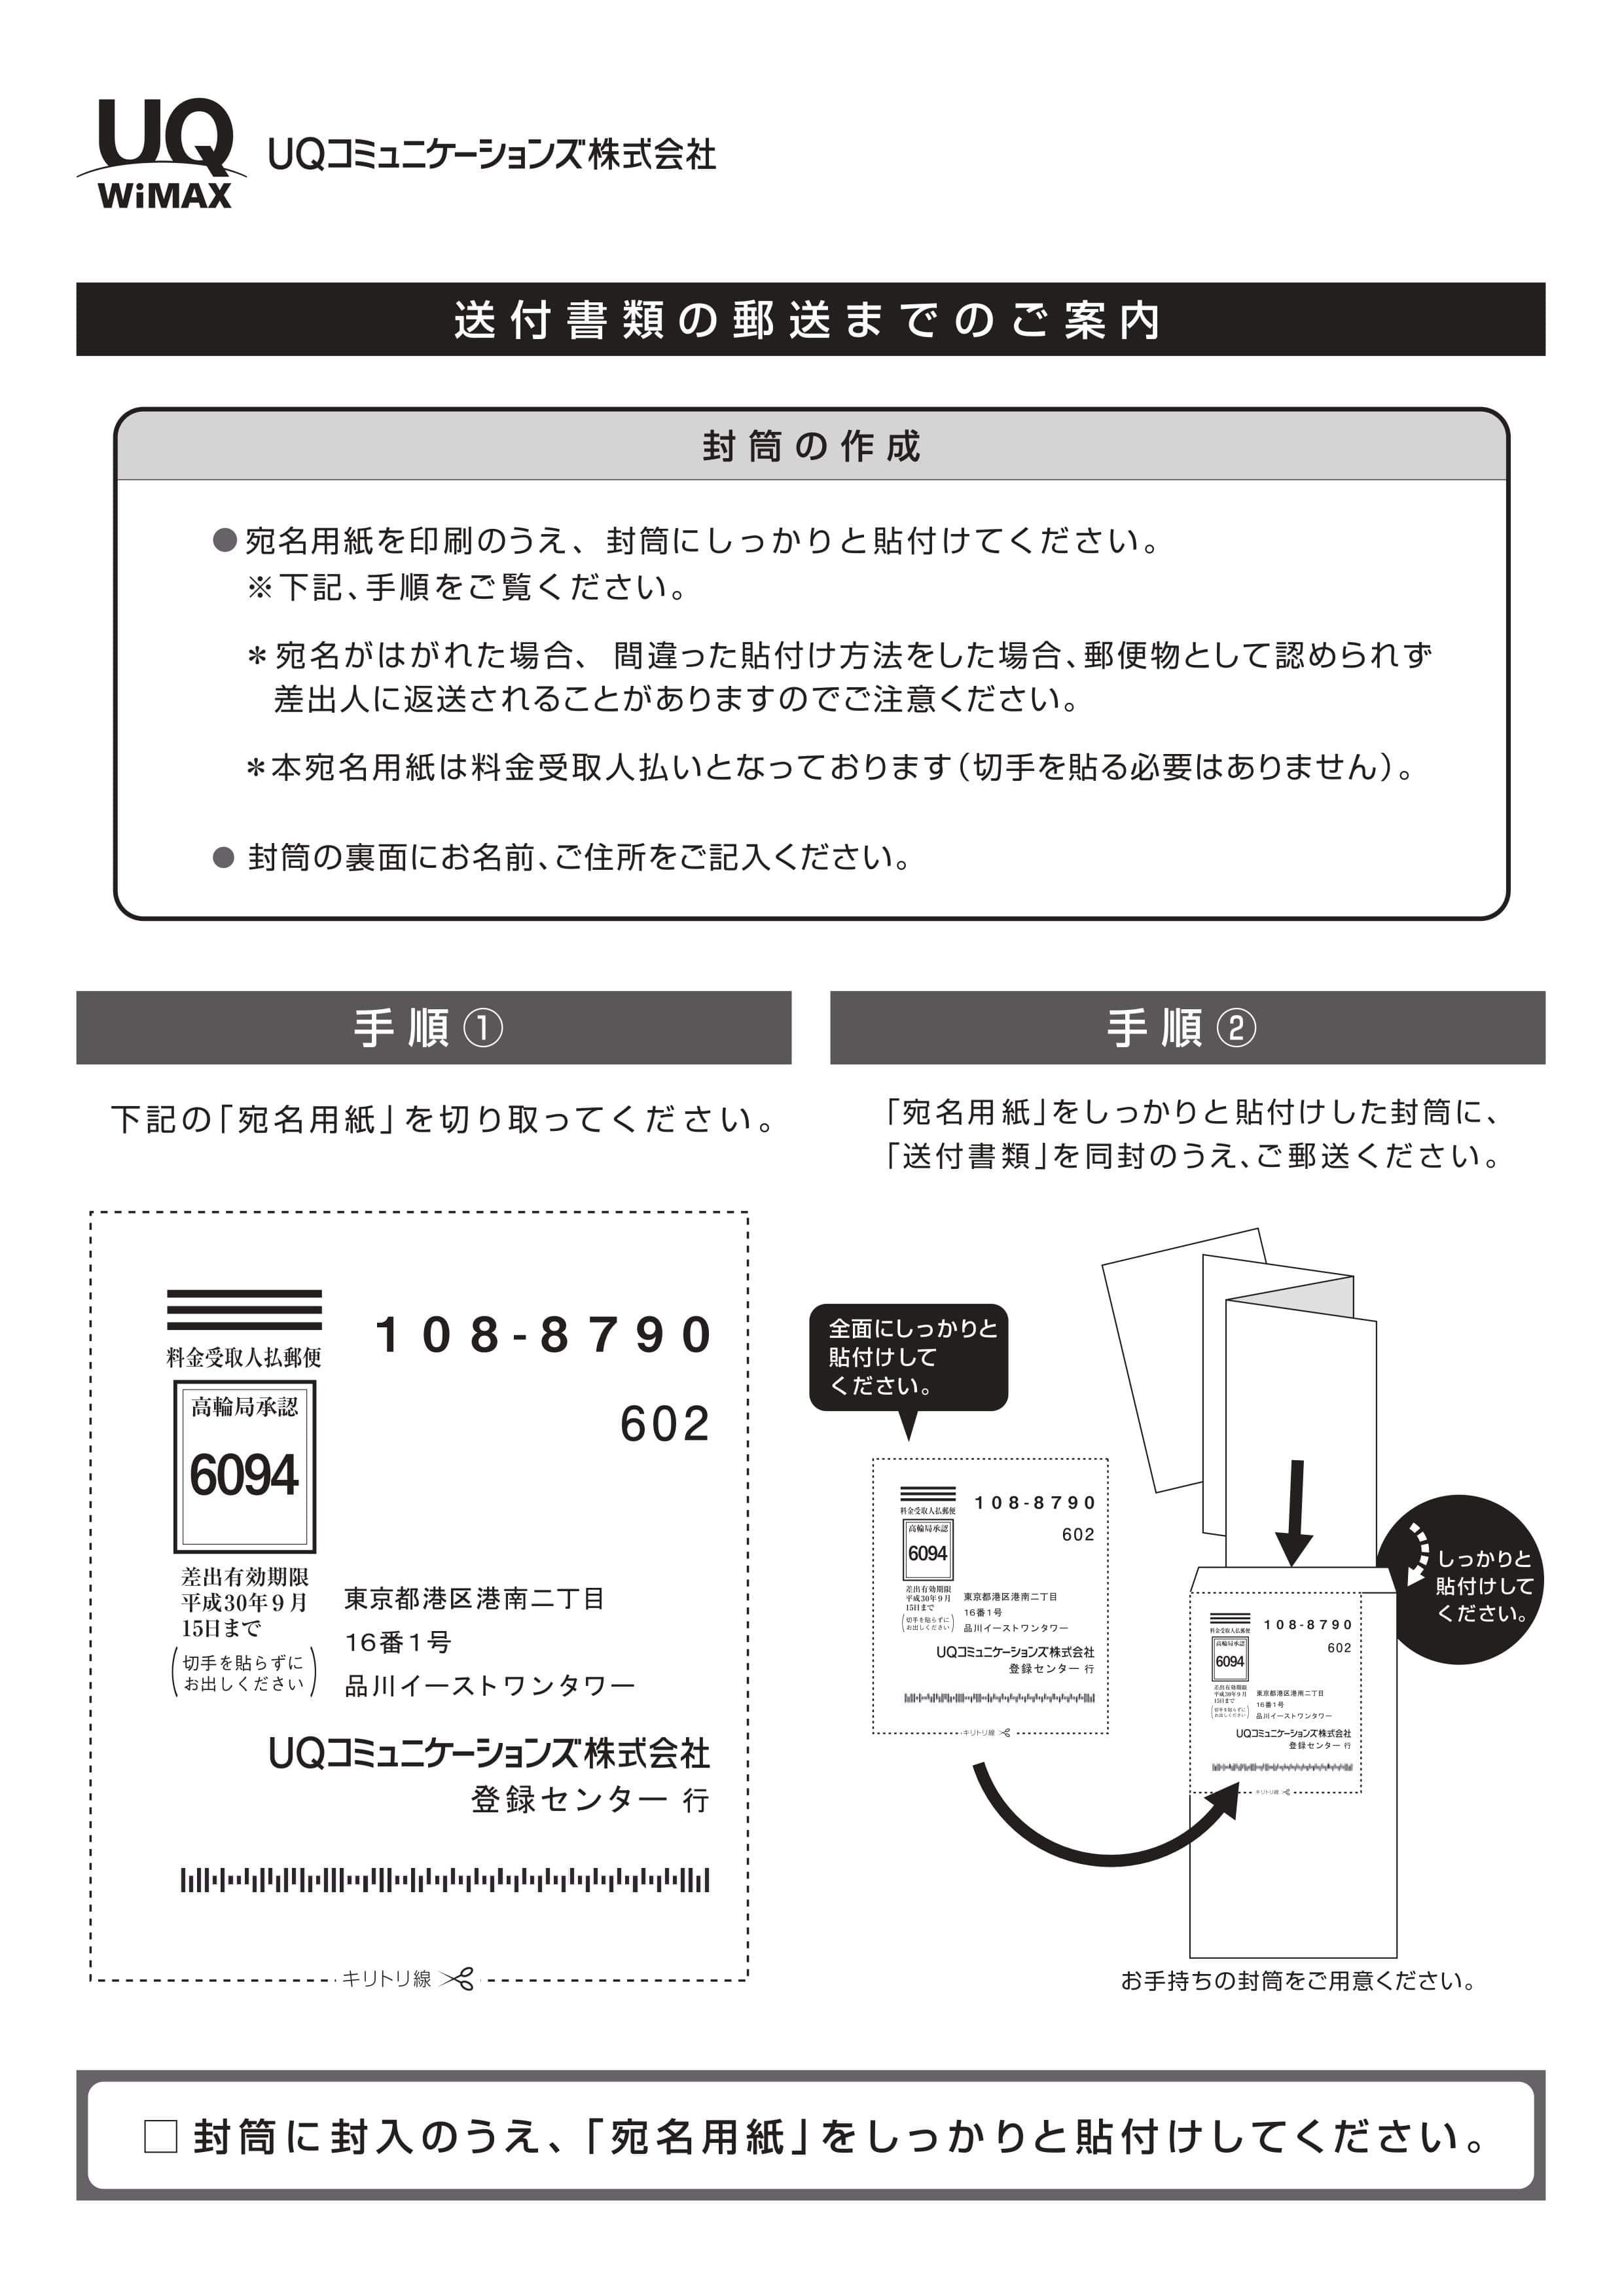 UQコミュニケーションズ郵送ラベル